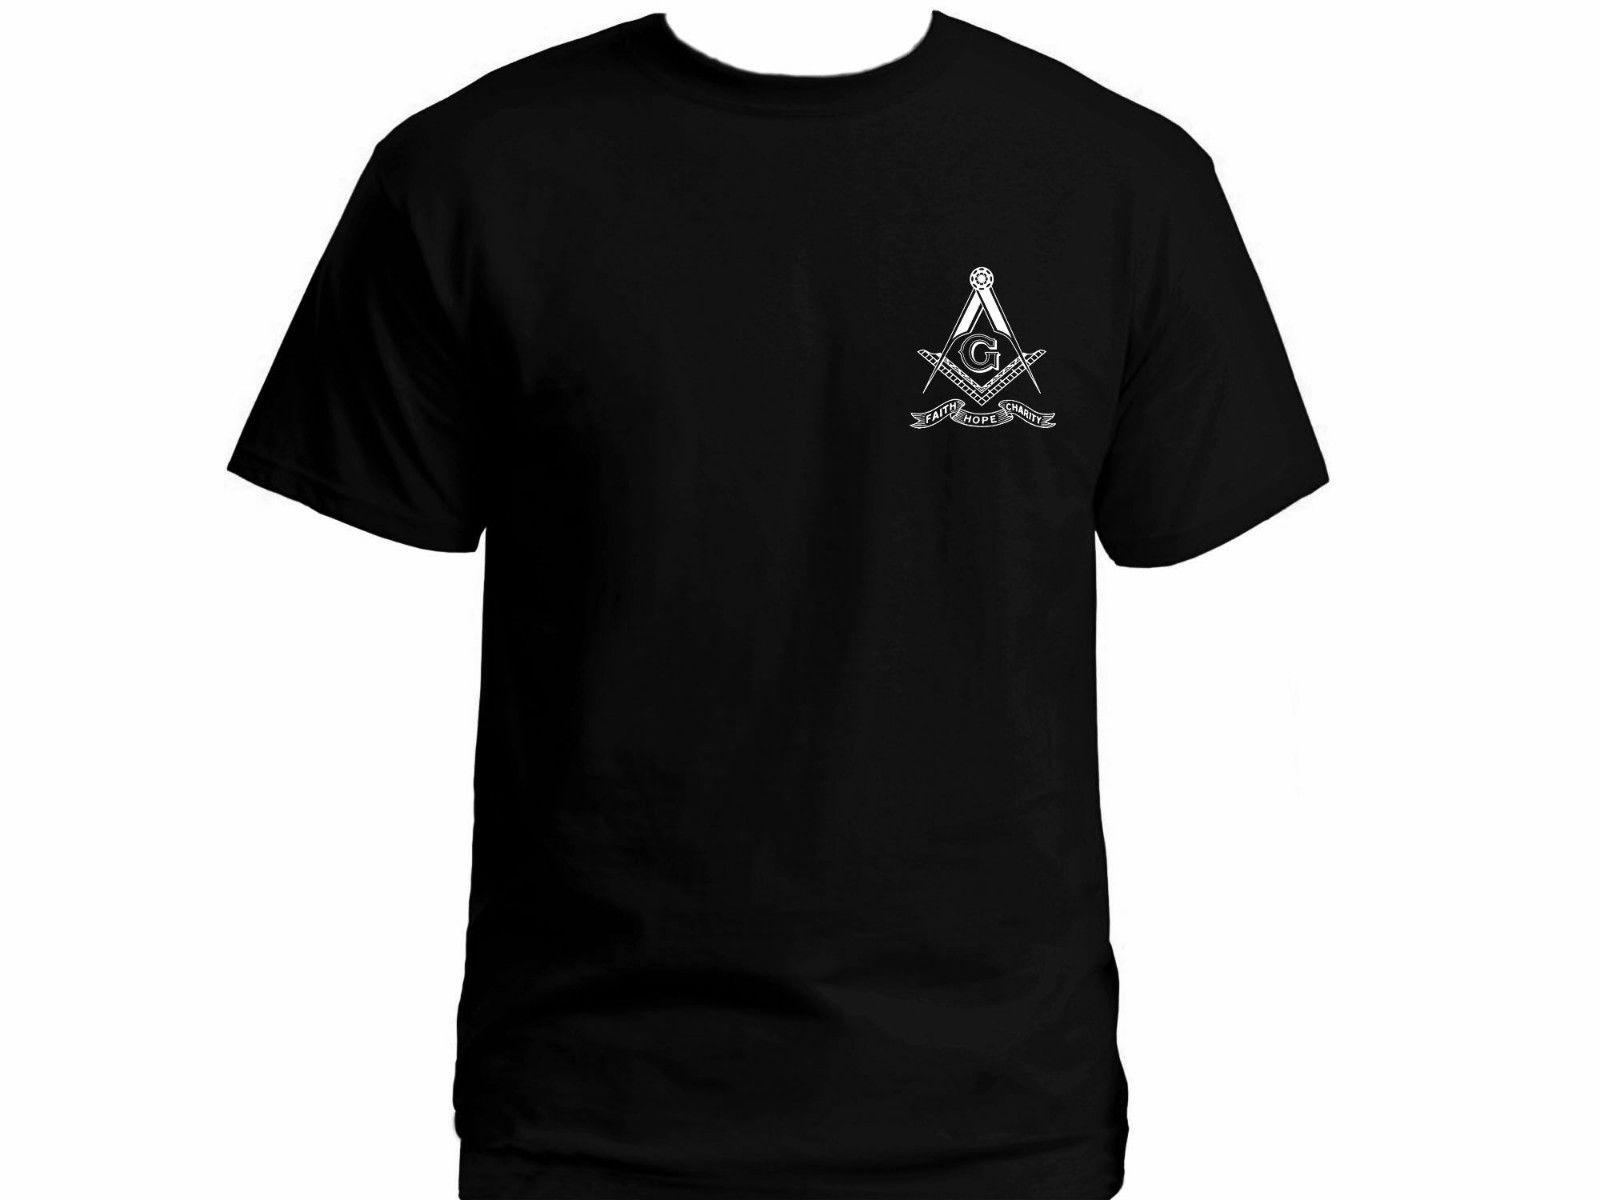 2019 Masonic Freemasons Square & Compasses Faith Hope Charity black graphic t-shirt